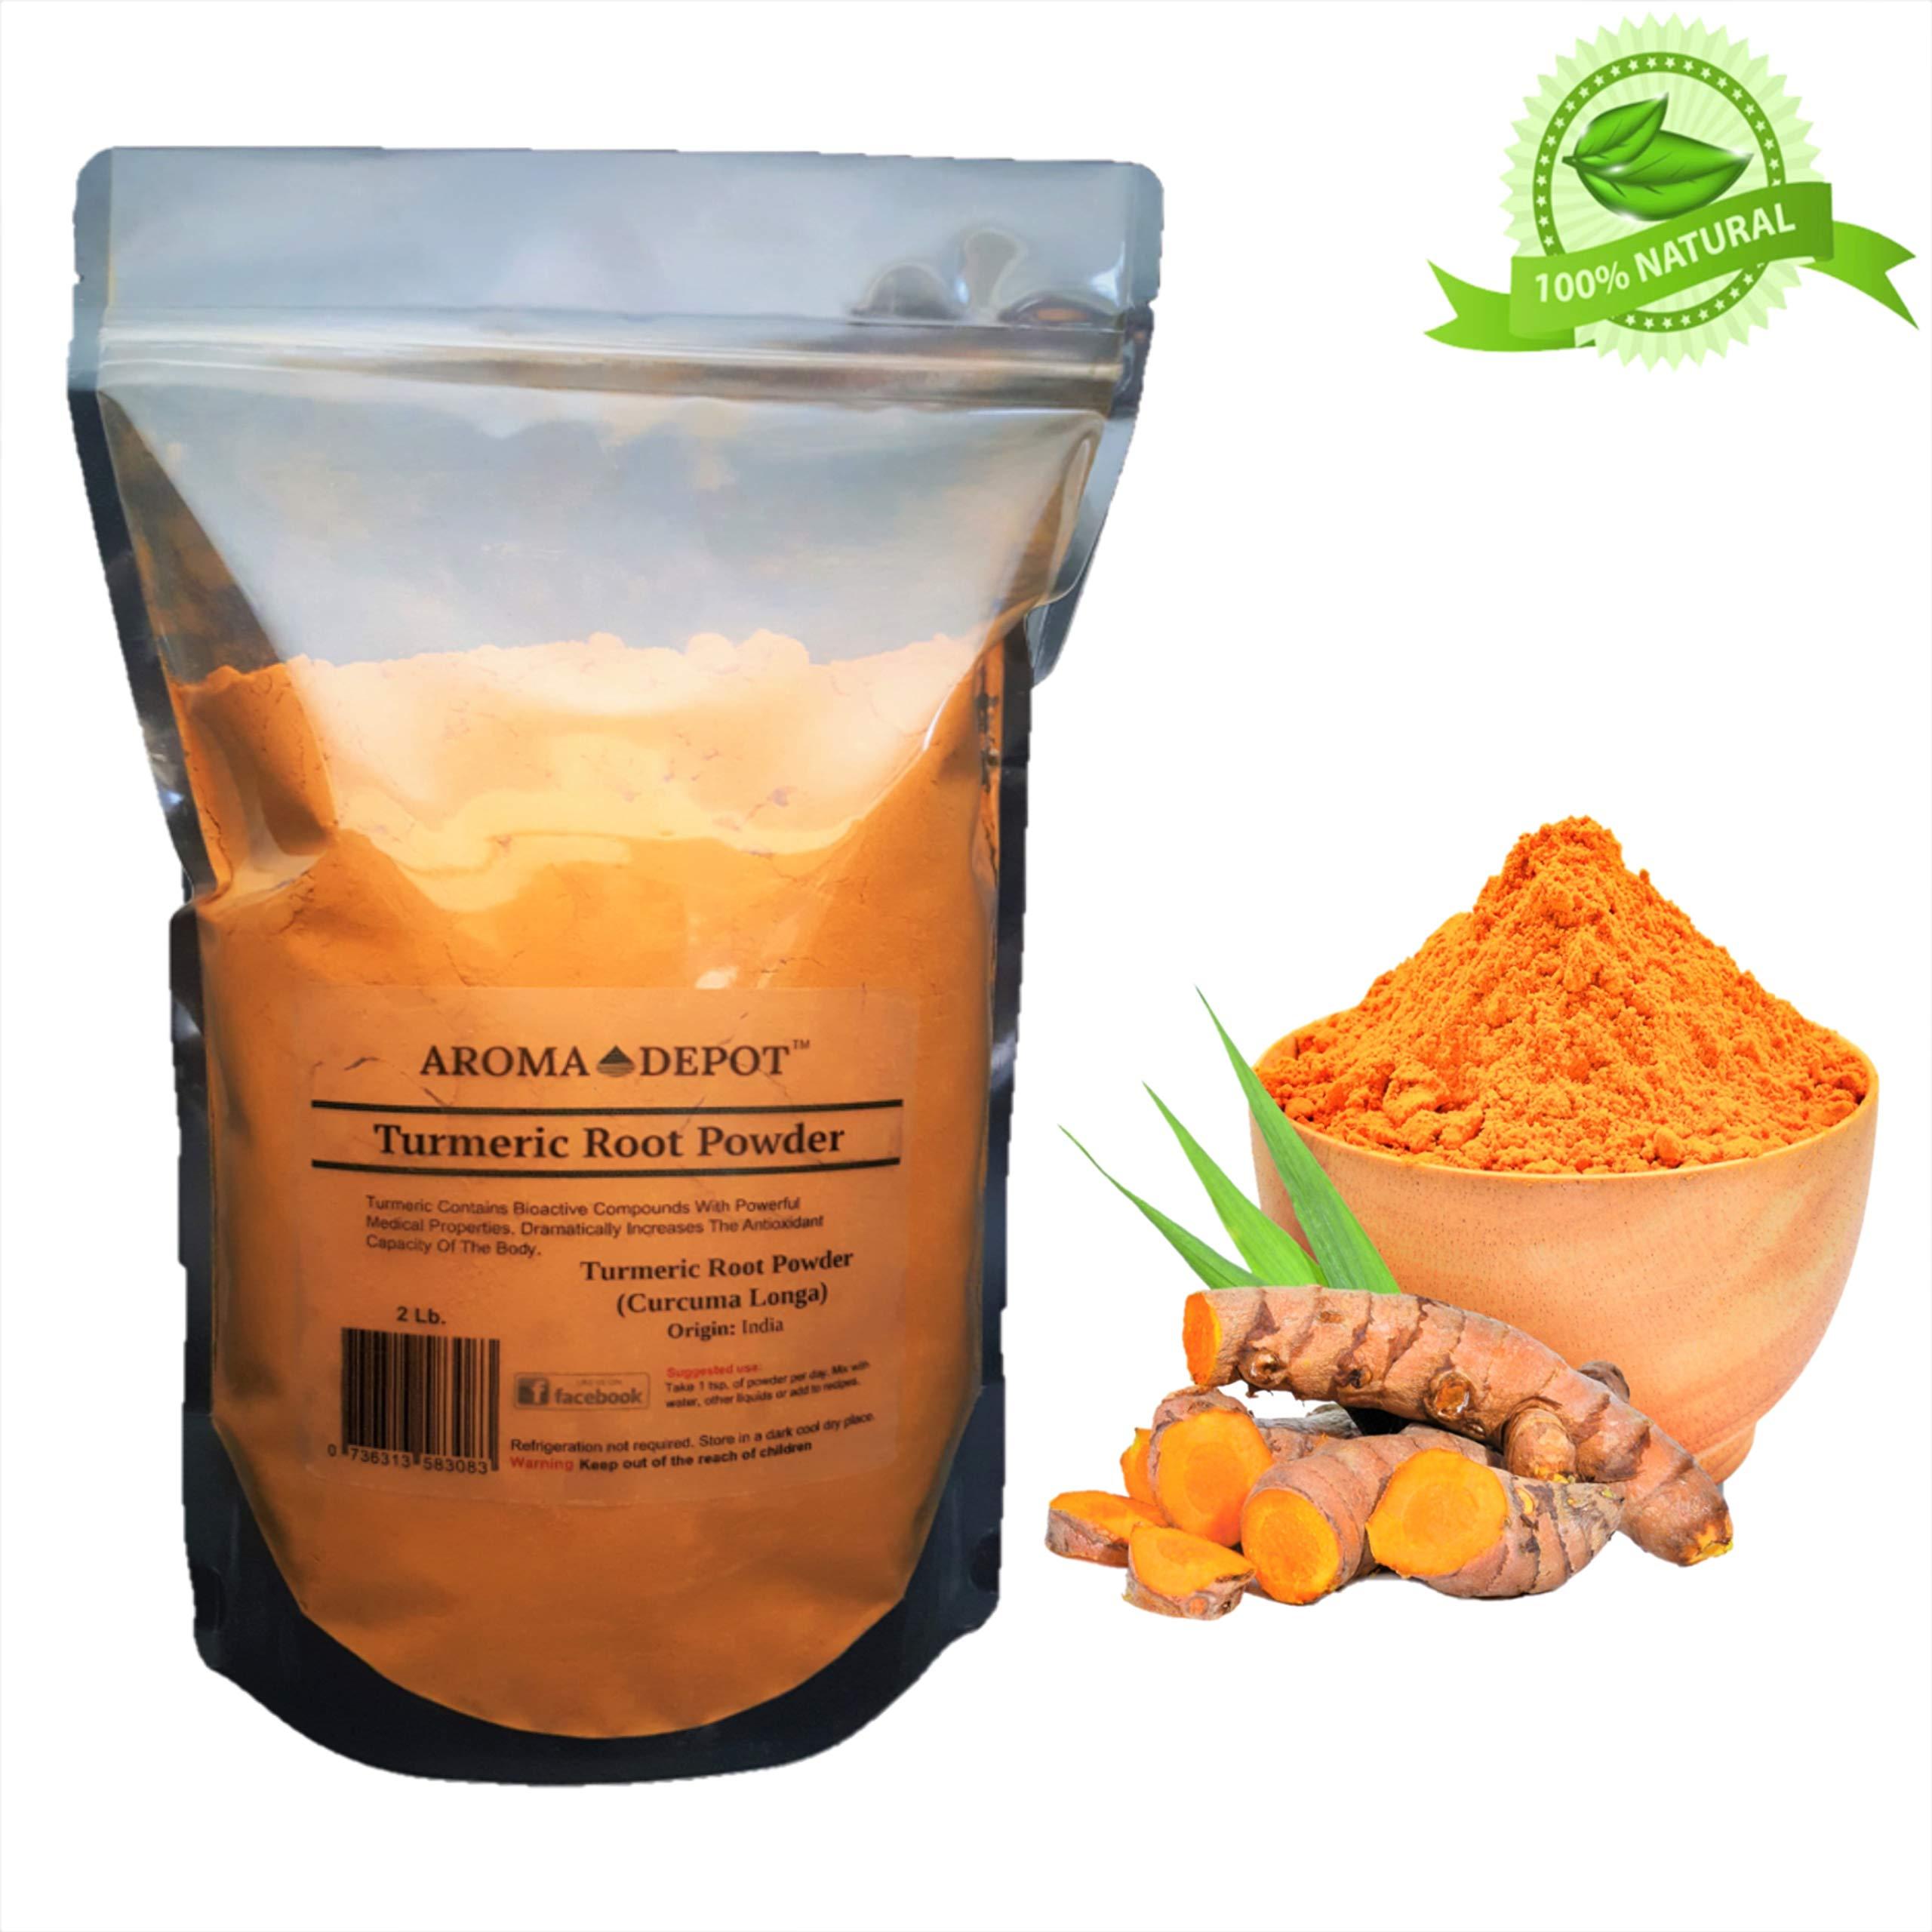 Aroma Depot 2lb/ 32 oz Organic Turmeric Ground Tumeric Root Powder 100% Pure (Curcuma Longa) Curcumin Powder Raw, Non-GMO & Gluten Free Antioxidants | Keto, Paleo, Vegan | Anti-Inflammatory From India